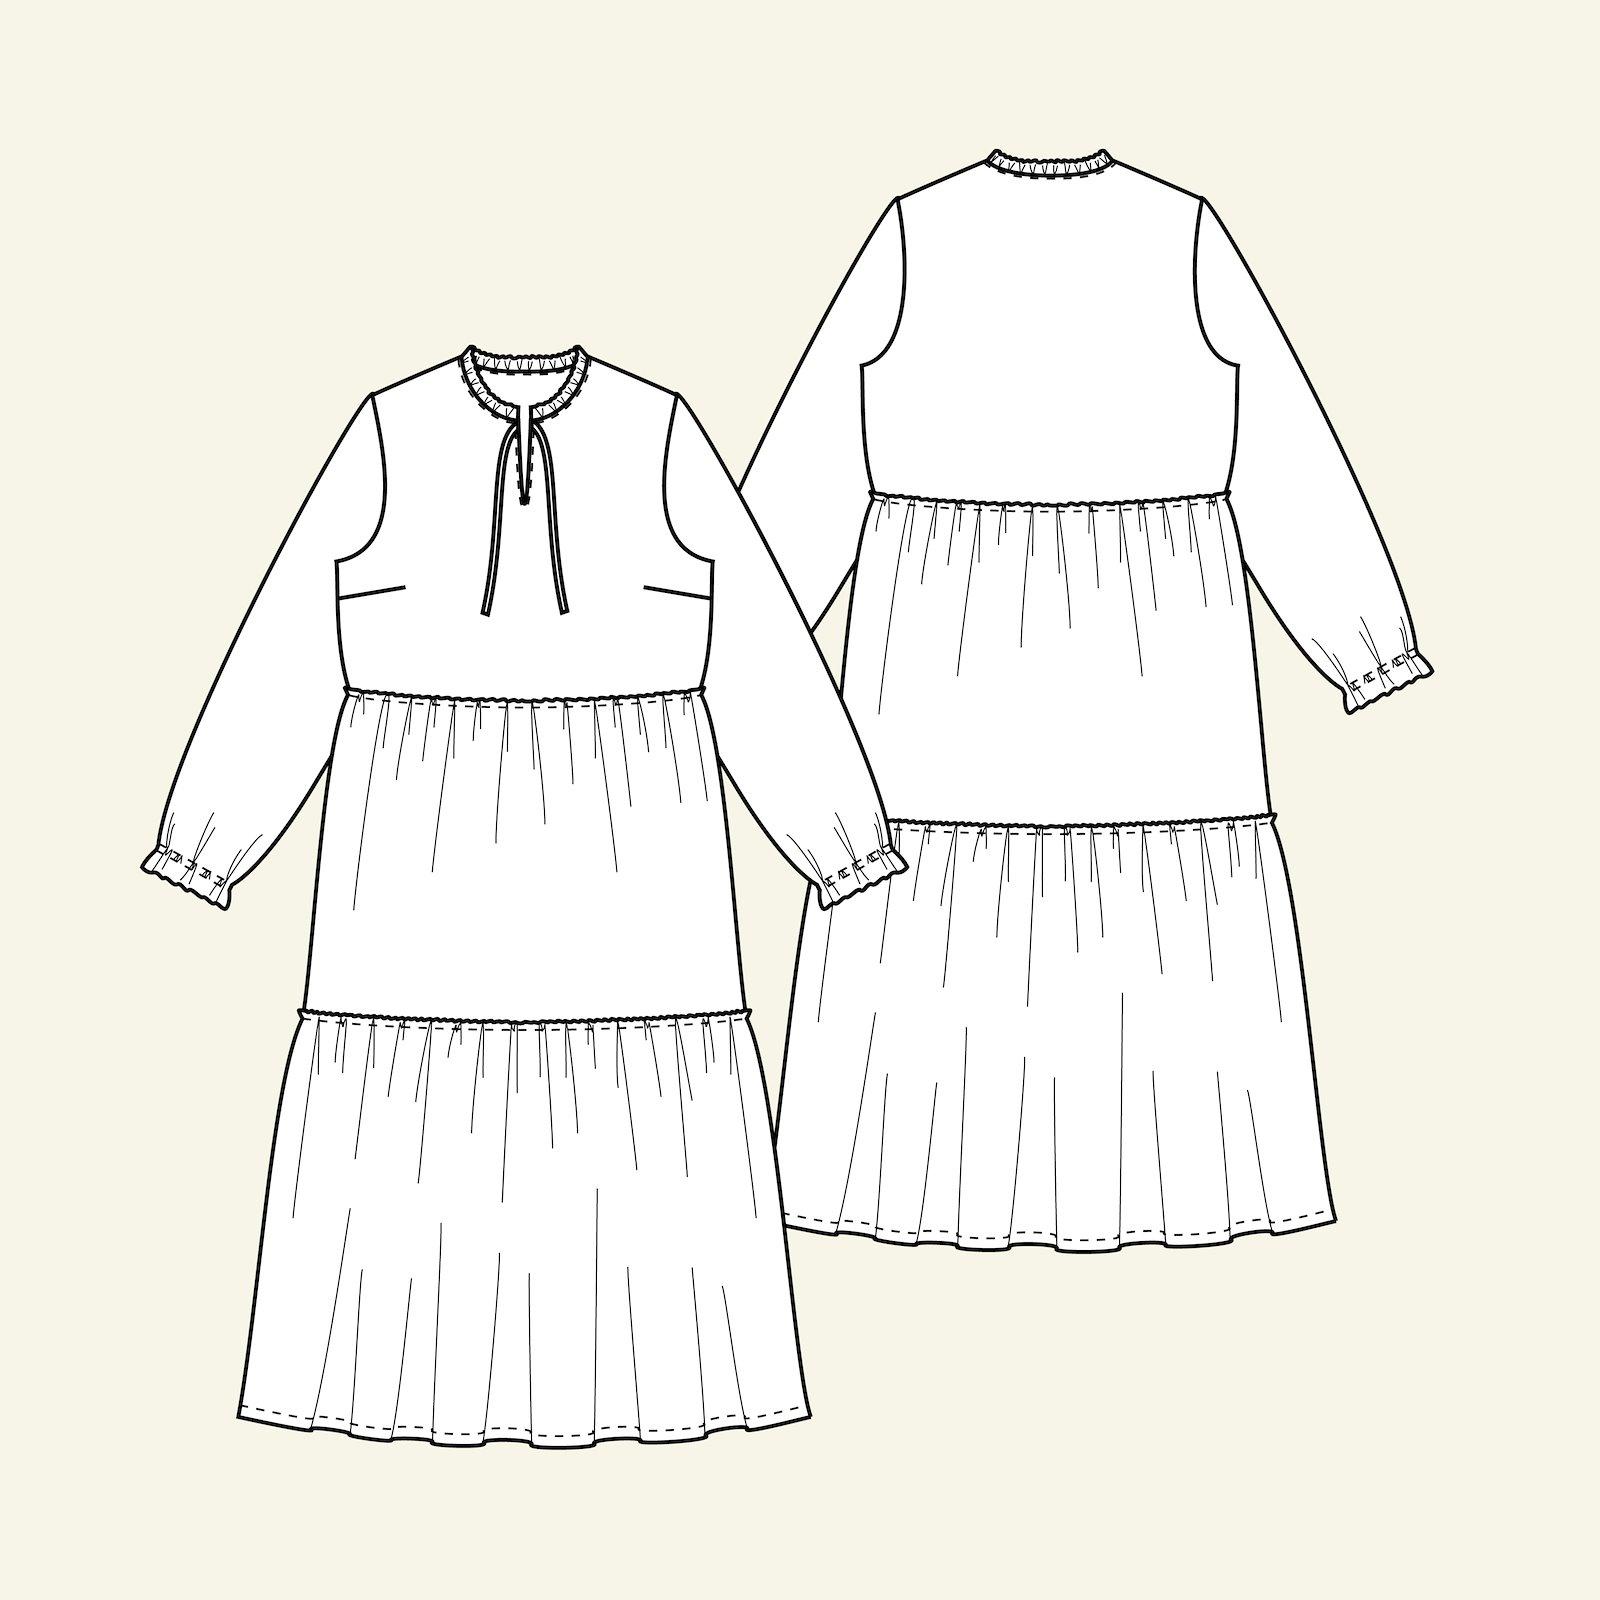 Smock dress, 38/10 p23159_pack